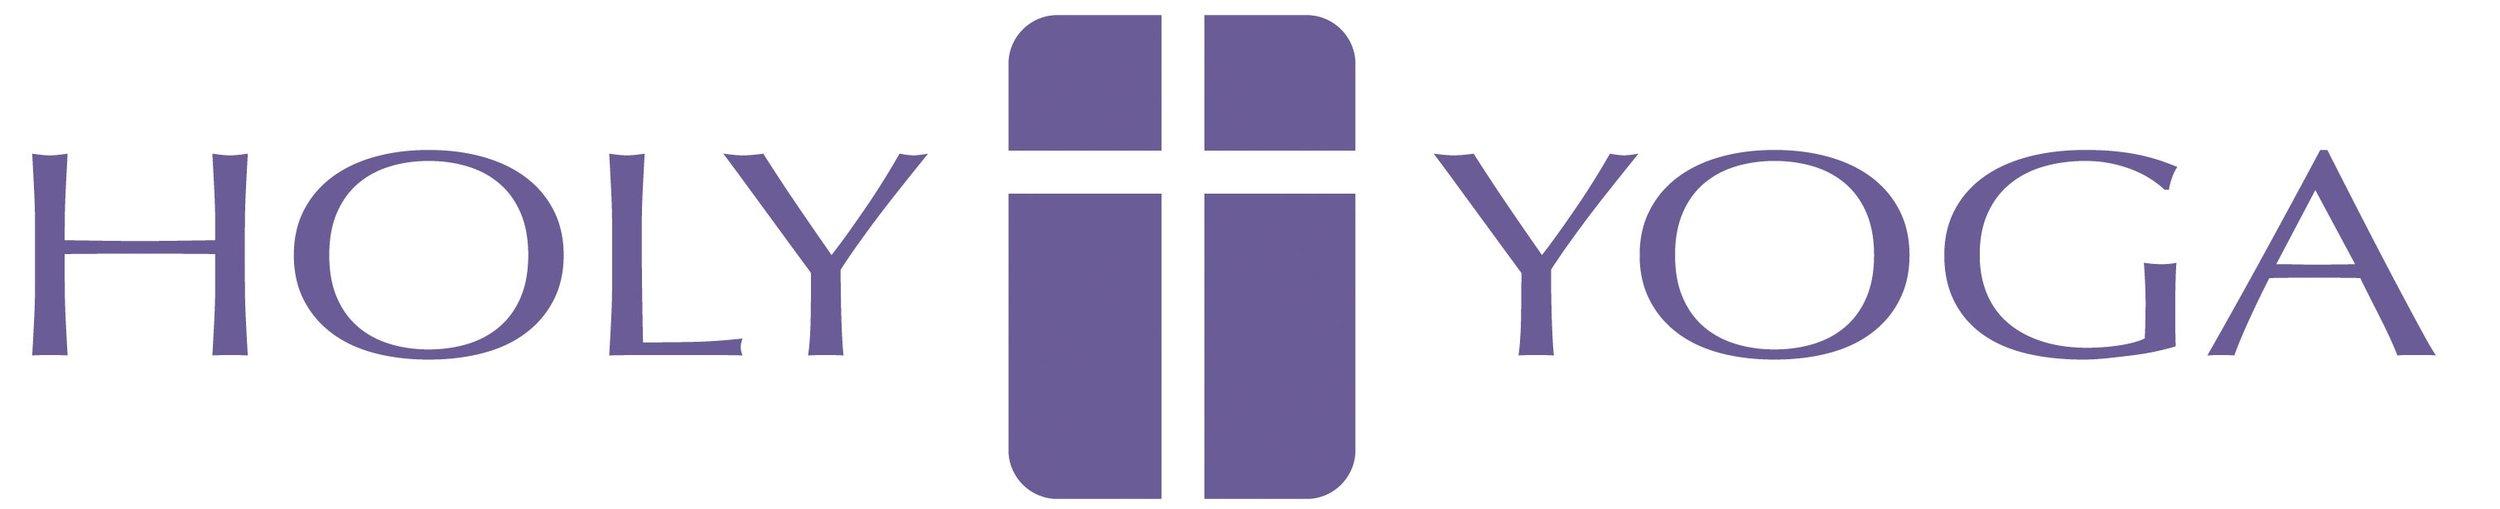 holy-yoga-high-resolution-logo_0.jpg